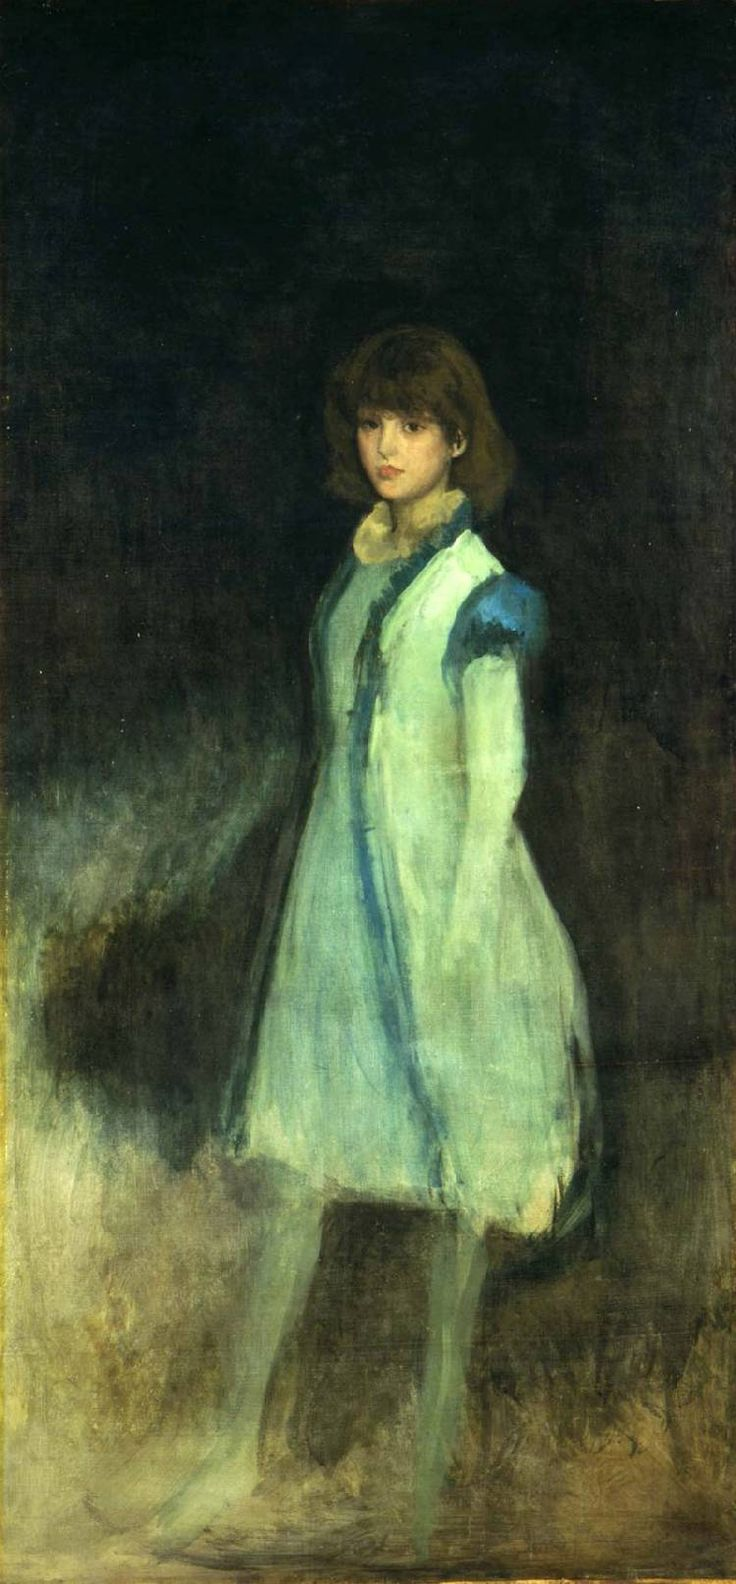 dappledwithshadow:  Т он Blue Girl: Портрет Конни Гилкрист Джеймс Макнейл Уистлер, 1879